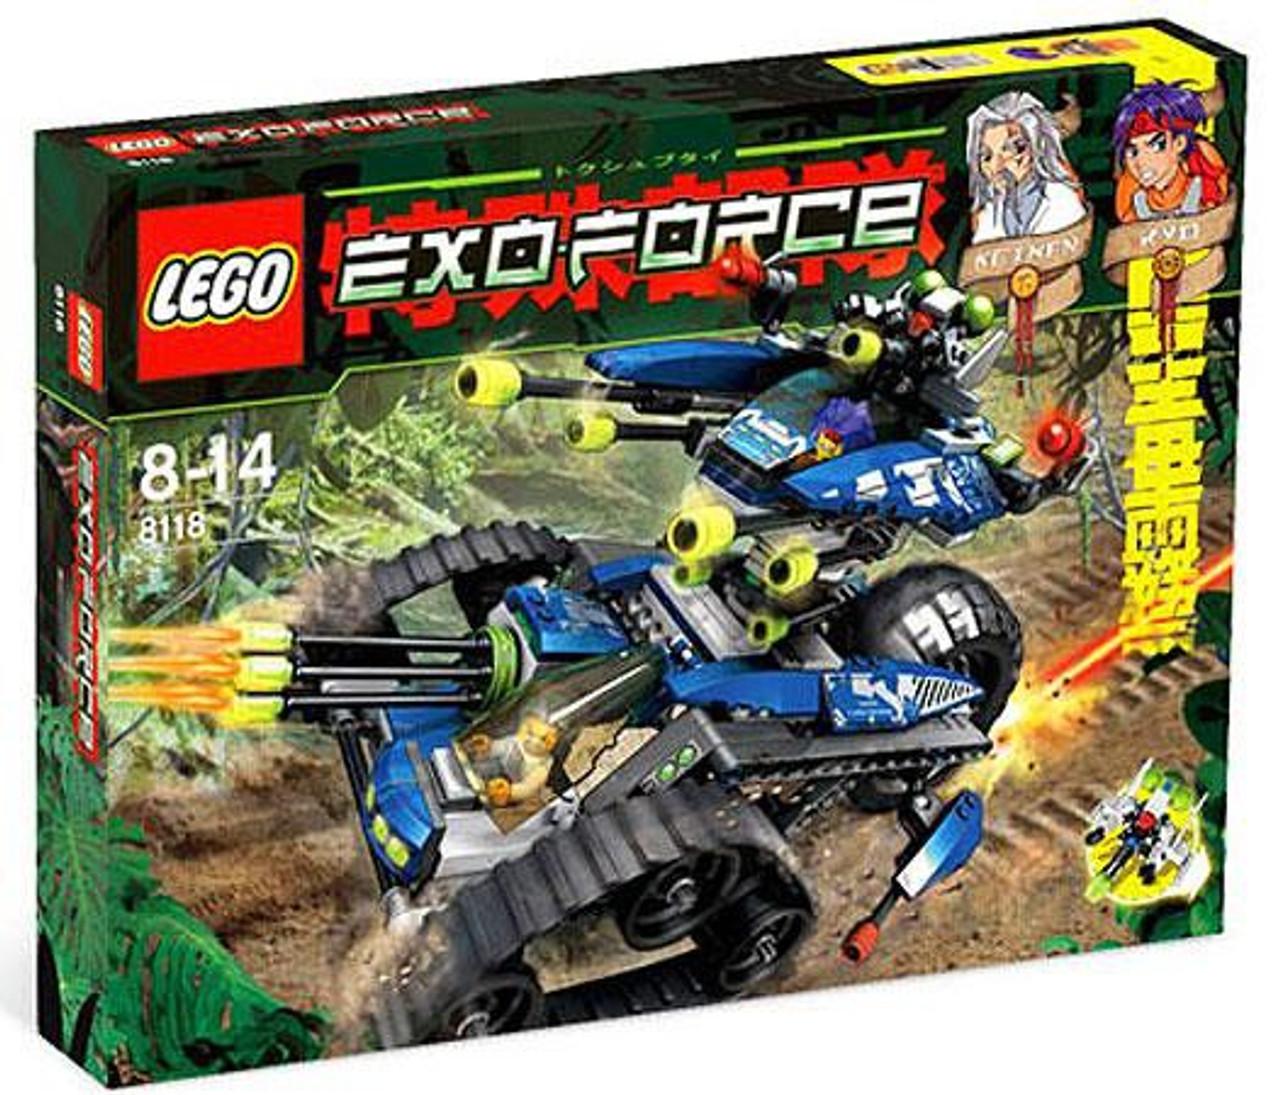 LEGO Exo Force Hybrid Rescue Tank Set #8118